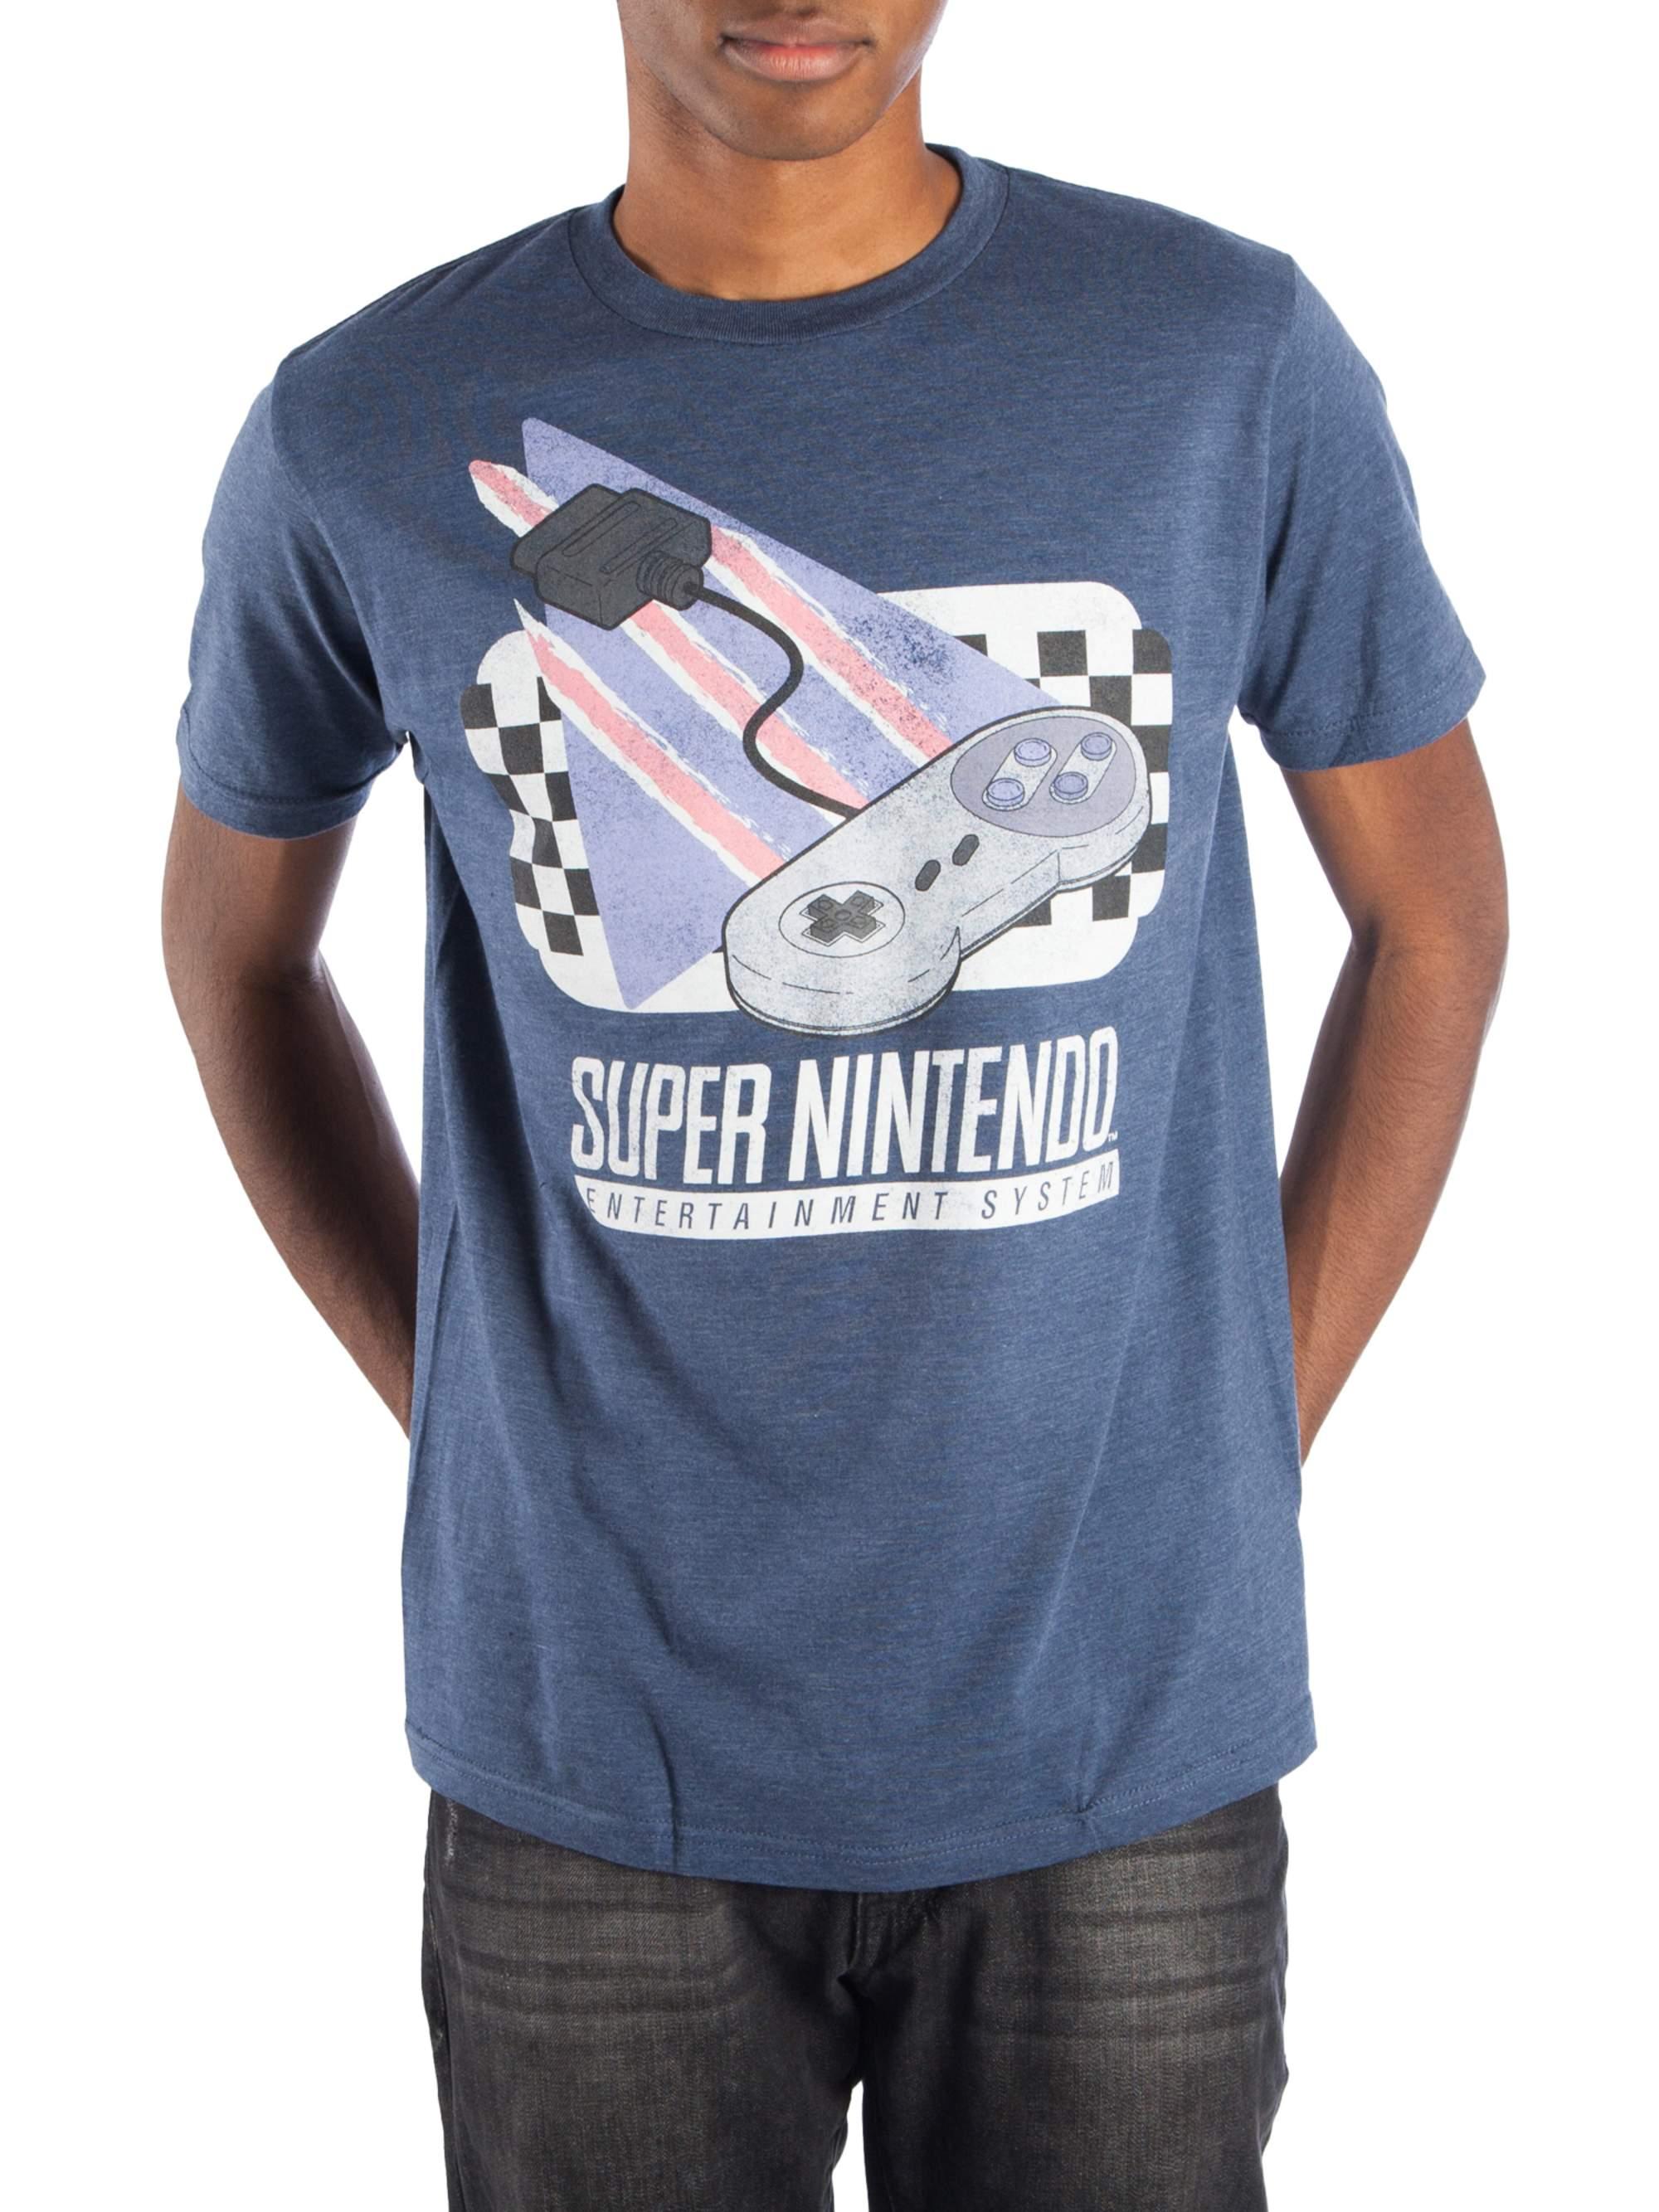 Super Nintendo Controller Men's Short Sleeve Graphic T-shirt, Up To 4XL